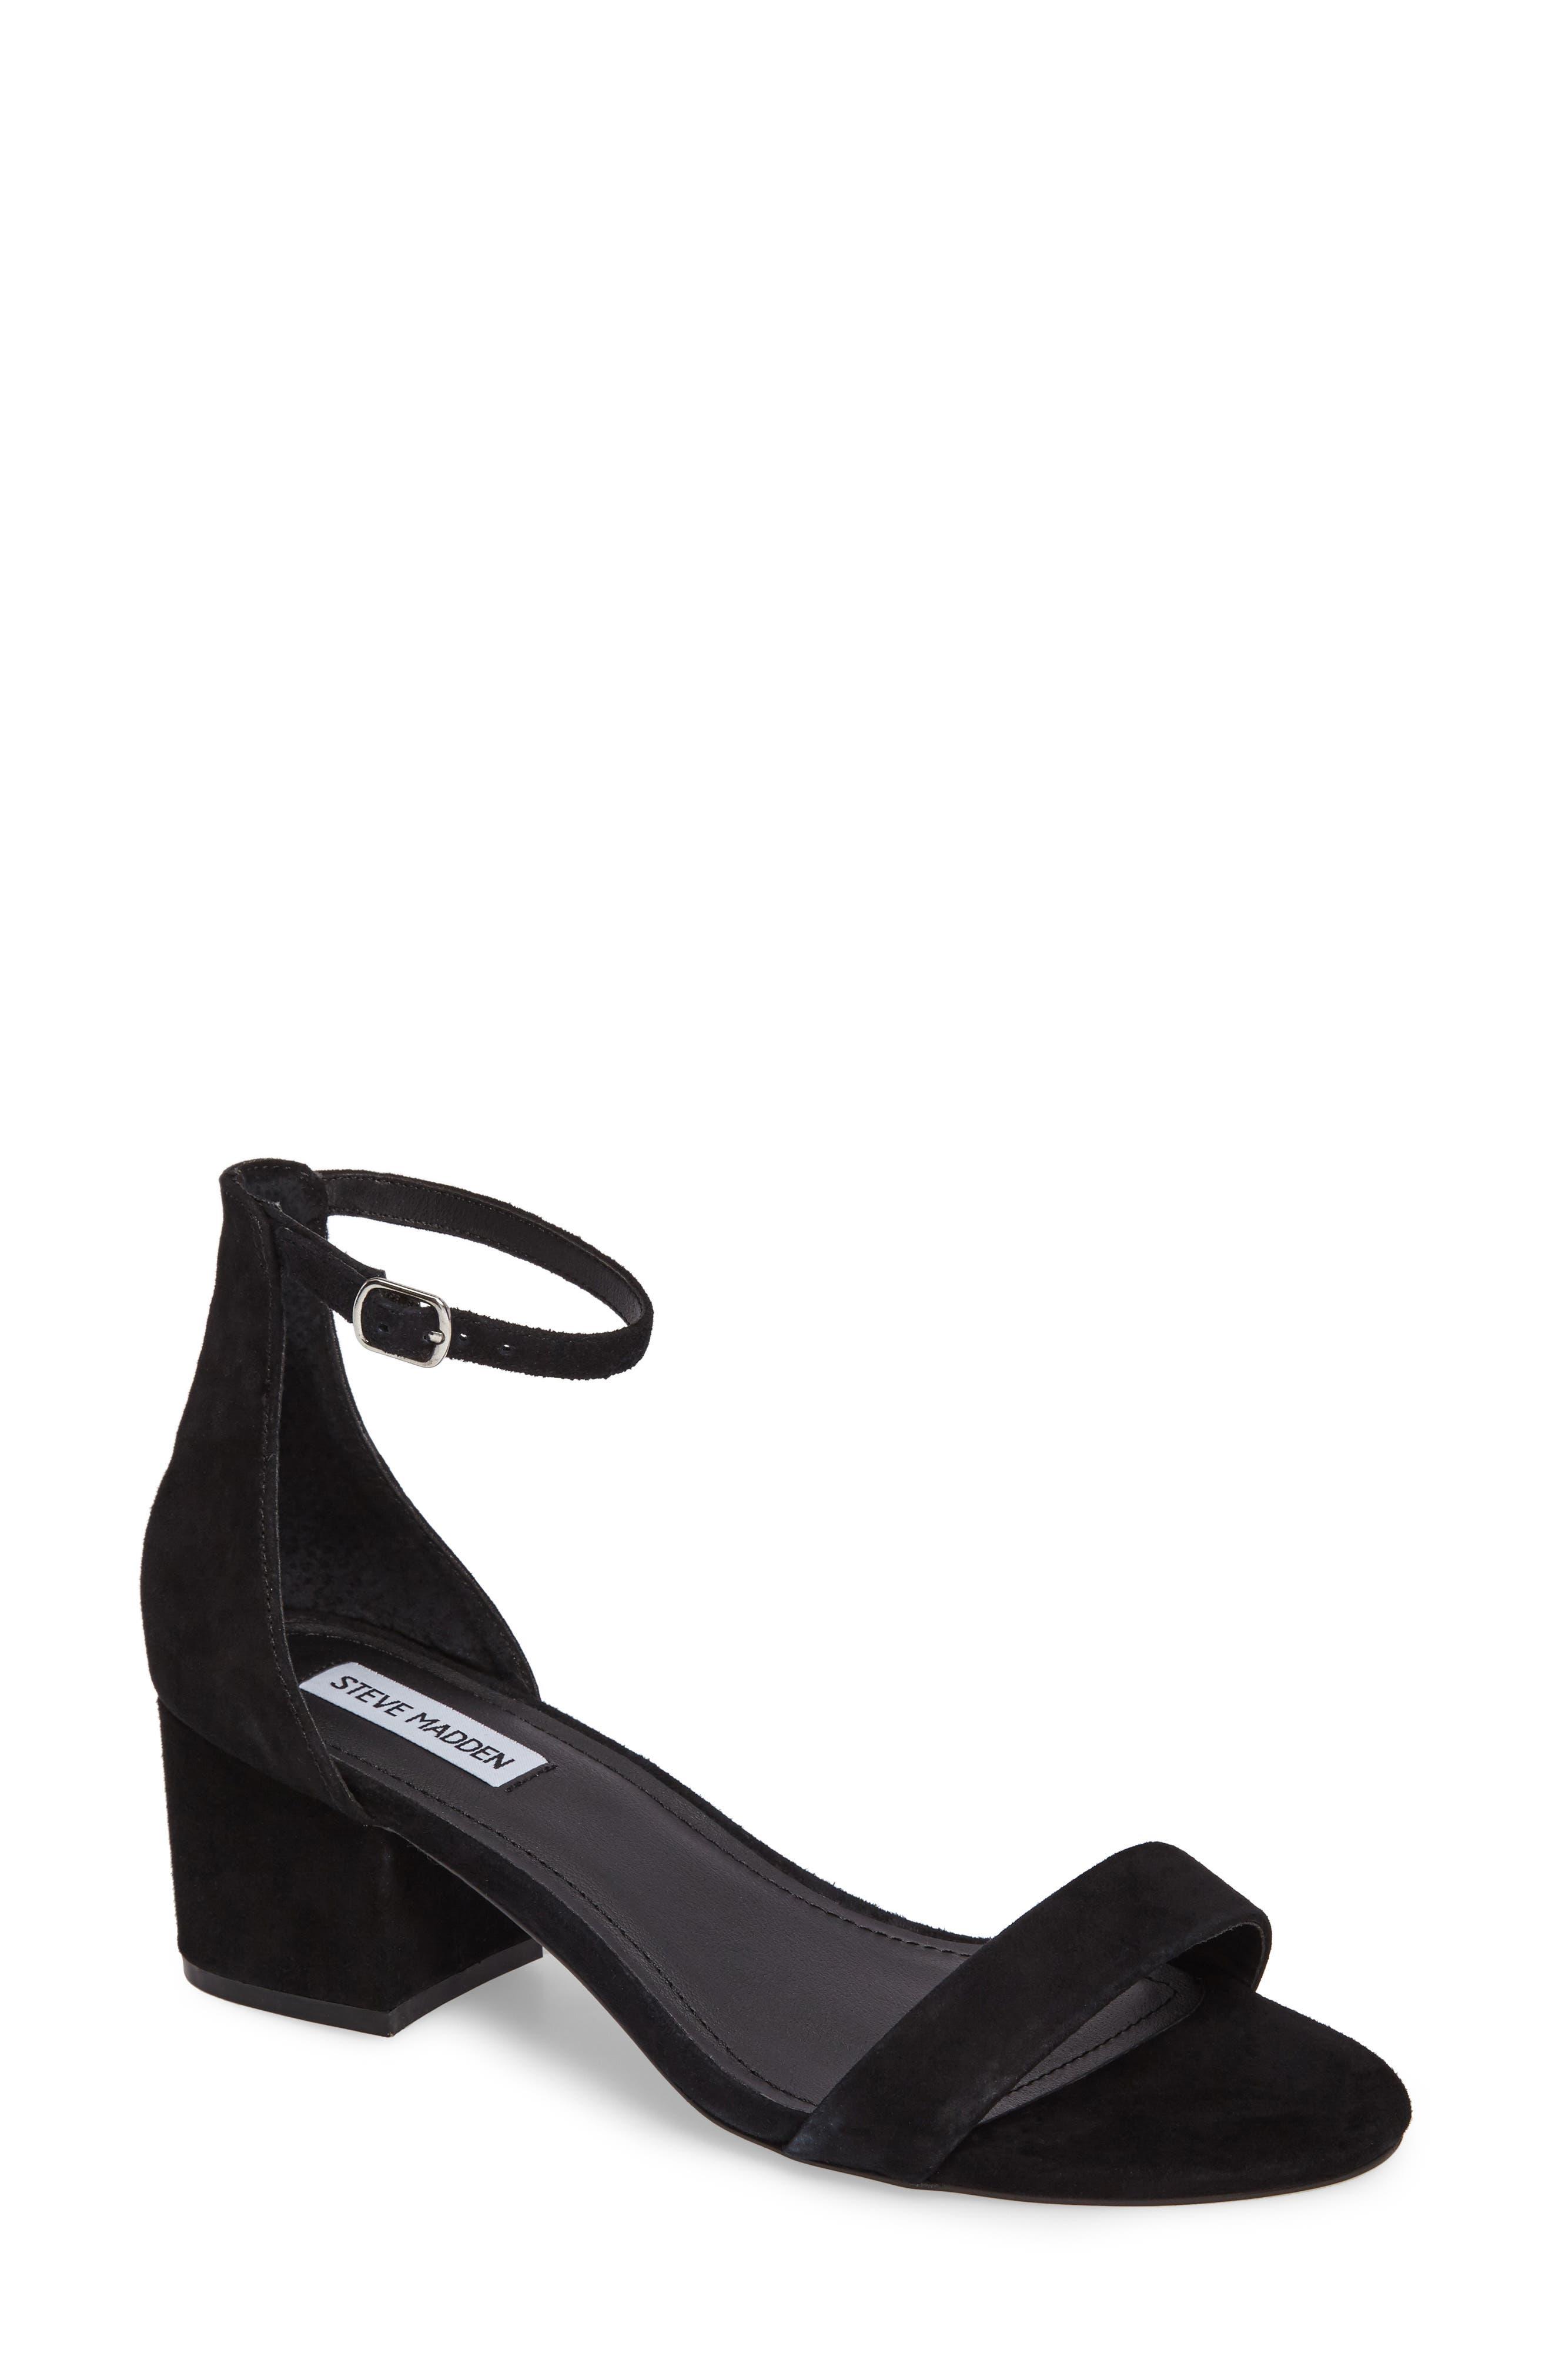 Irenee Ankle Strap Sandal,                             Main thumbnail 4, color,